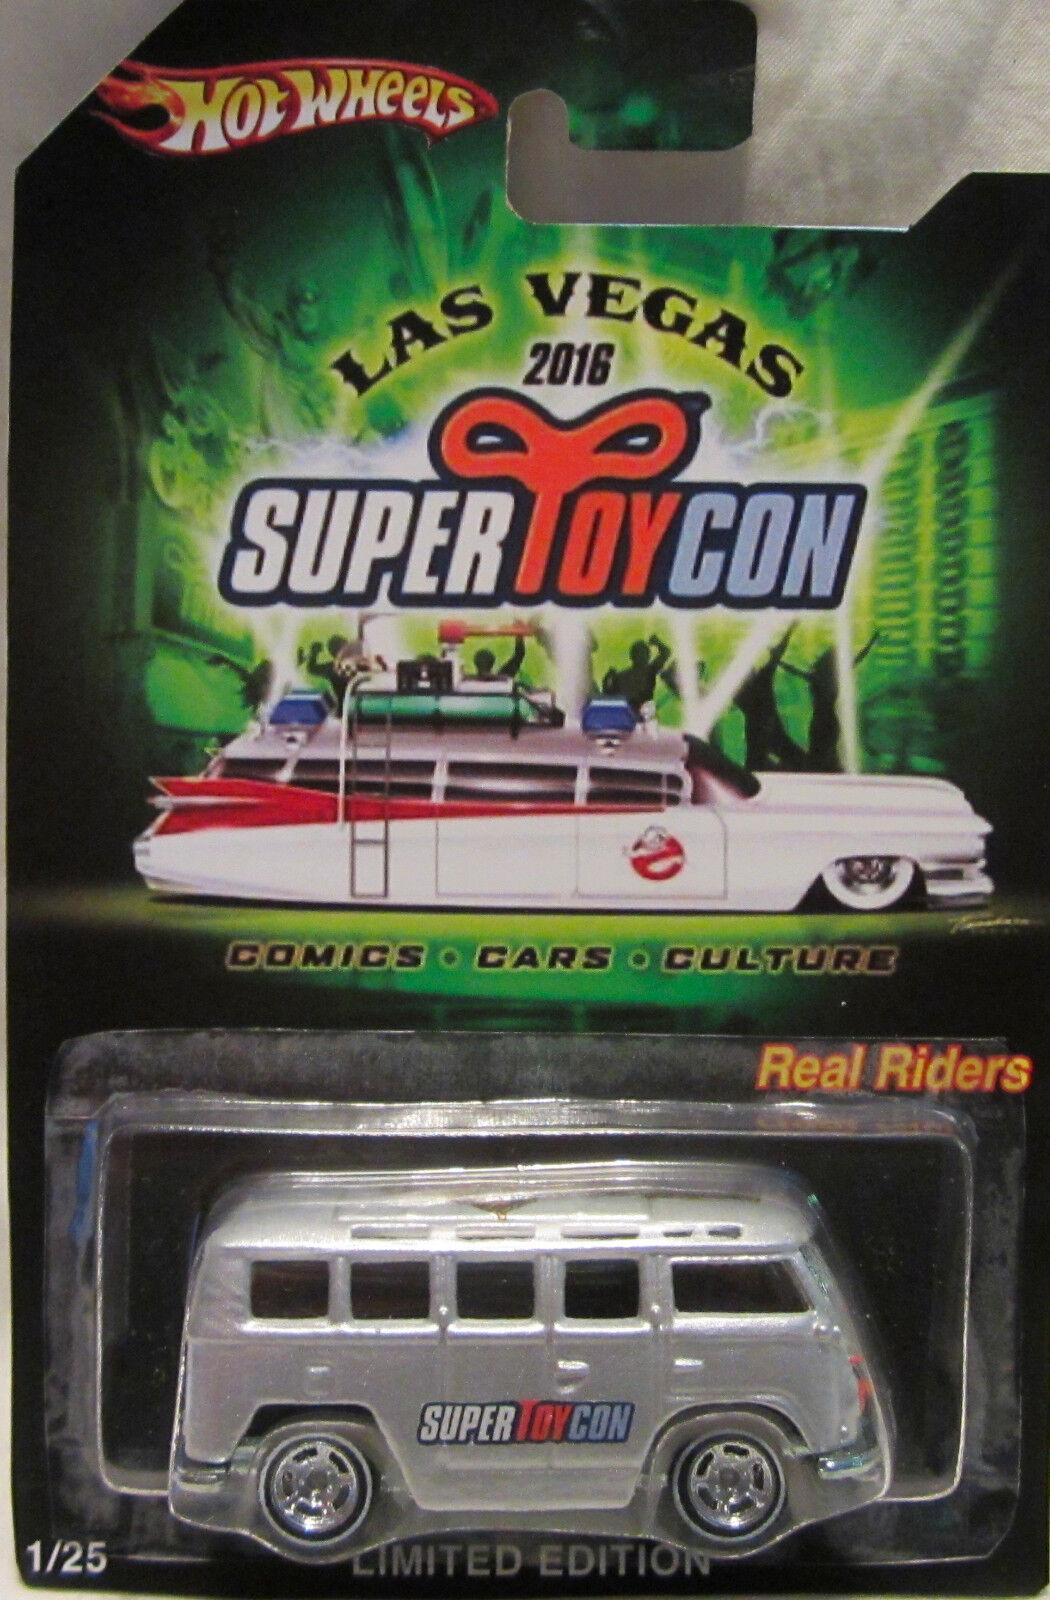 Hot Wheels CUSTOM VW DELUXE WAGON 2016 Las Vegas Con. Real Riders 1 25 Made